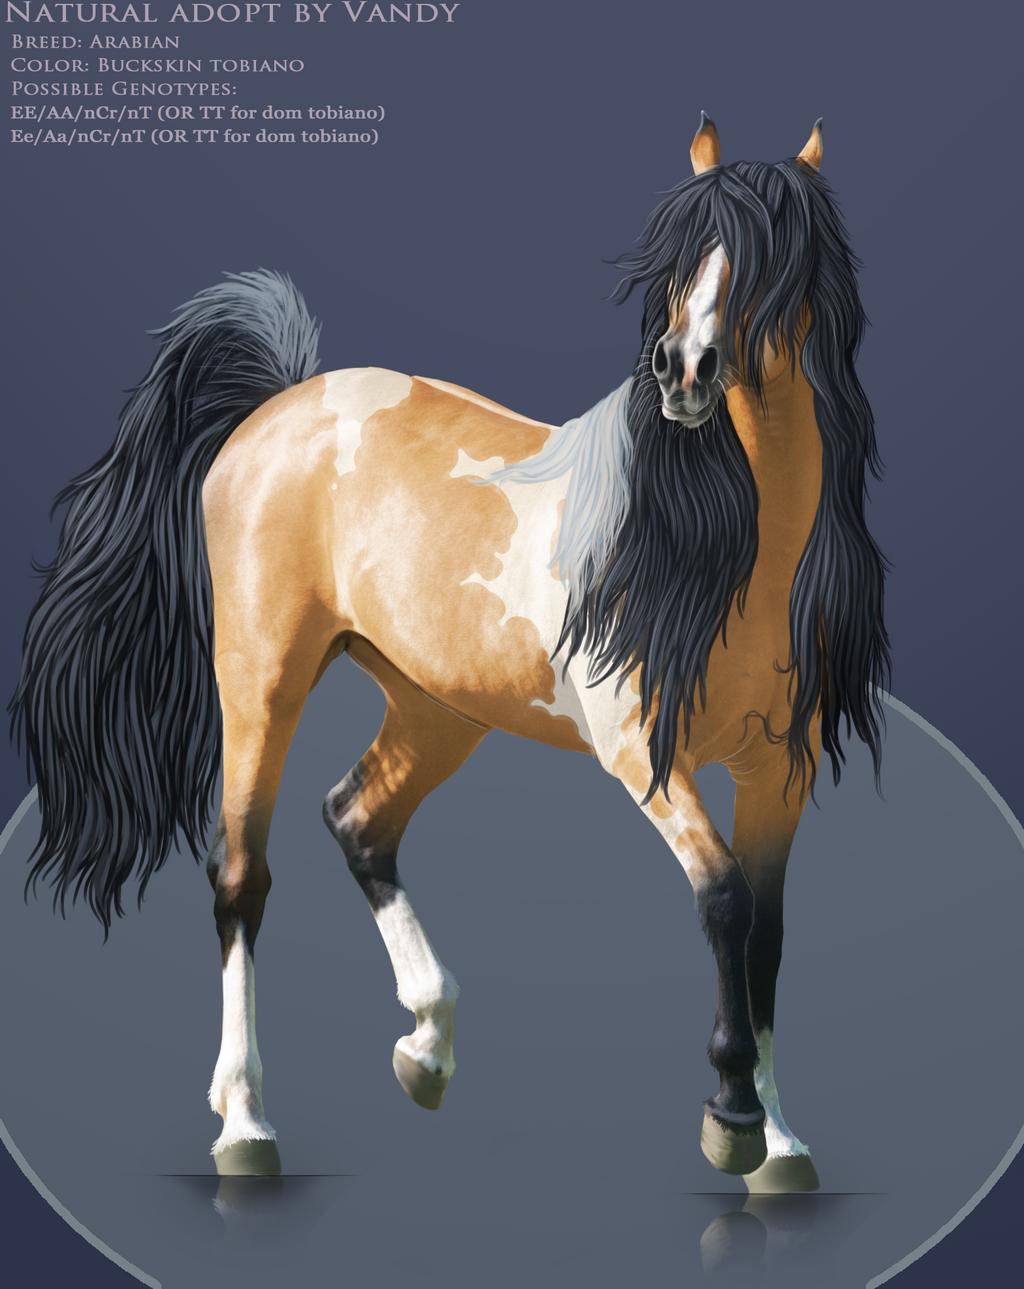 Buckskin tobiano horse